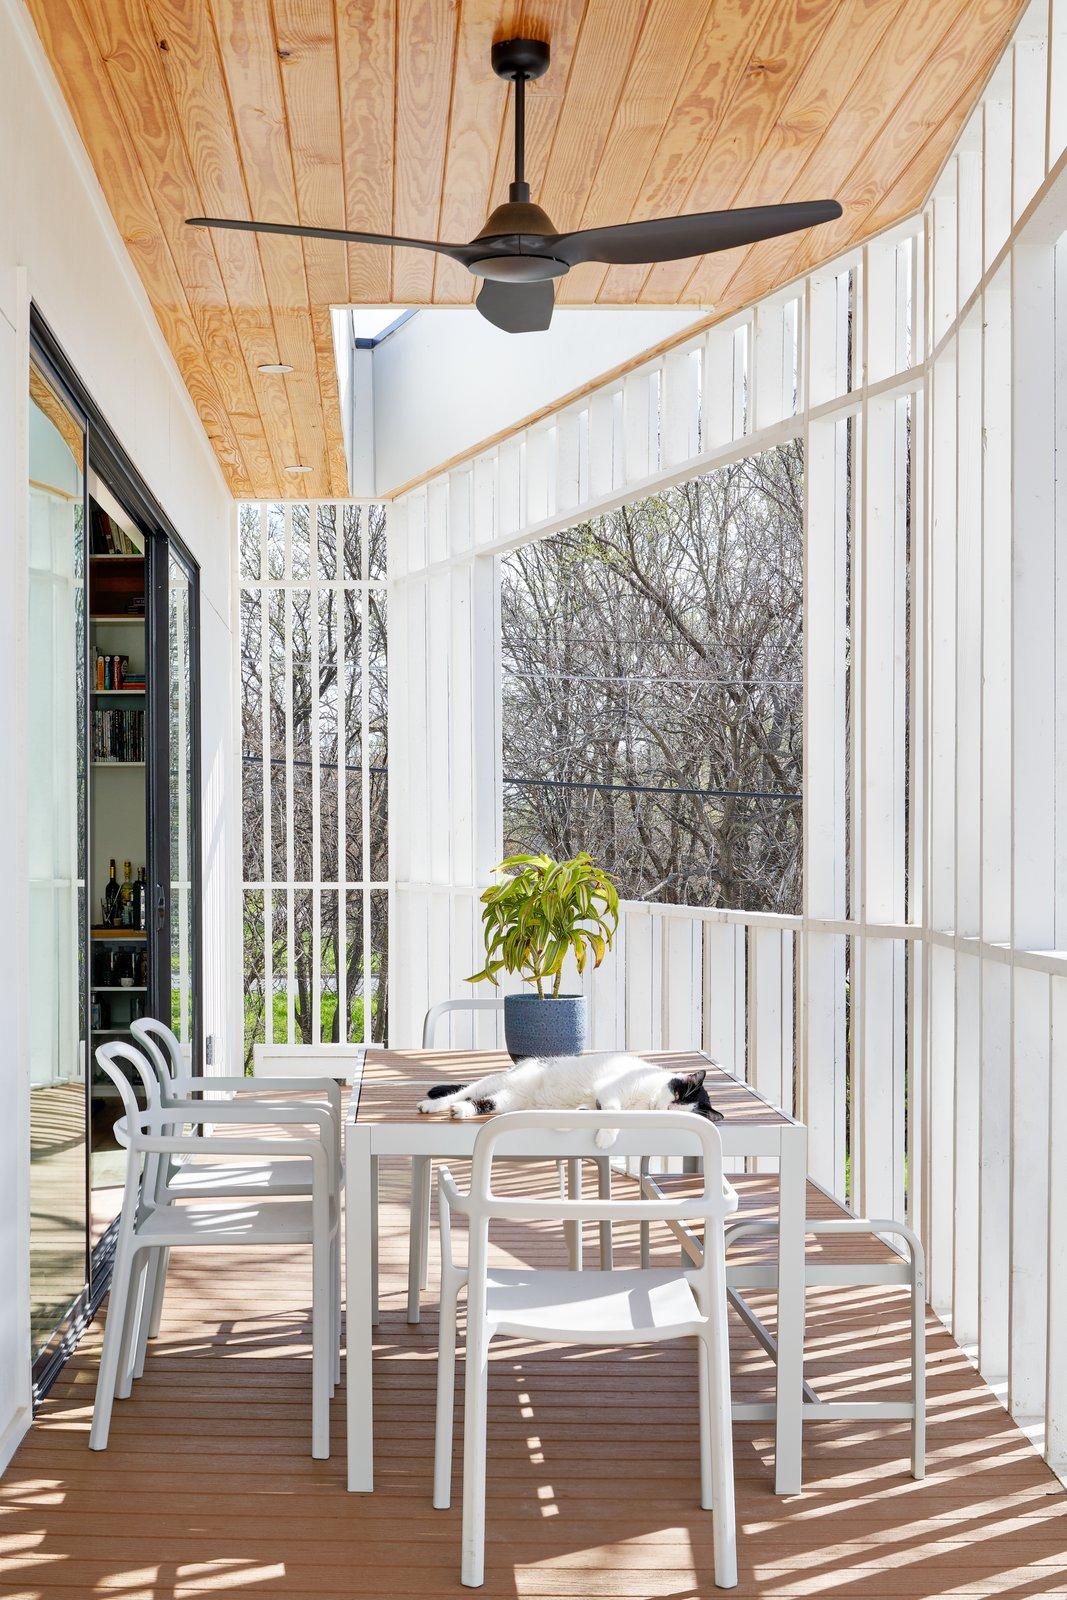 Maude Street House patio